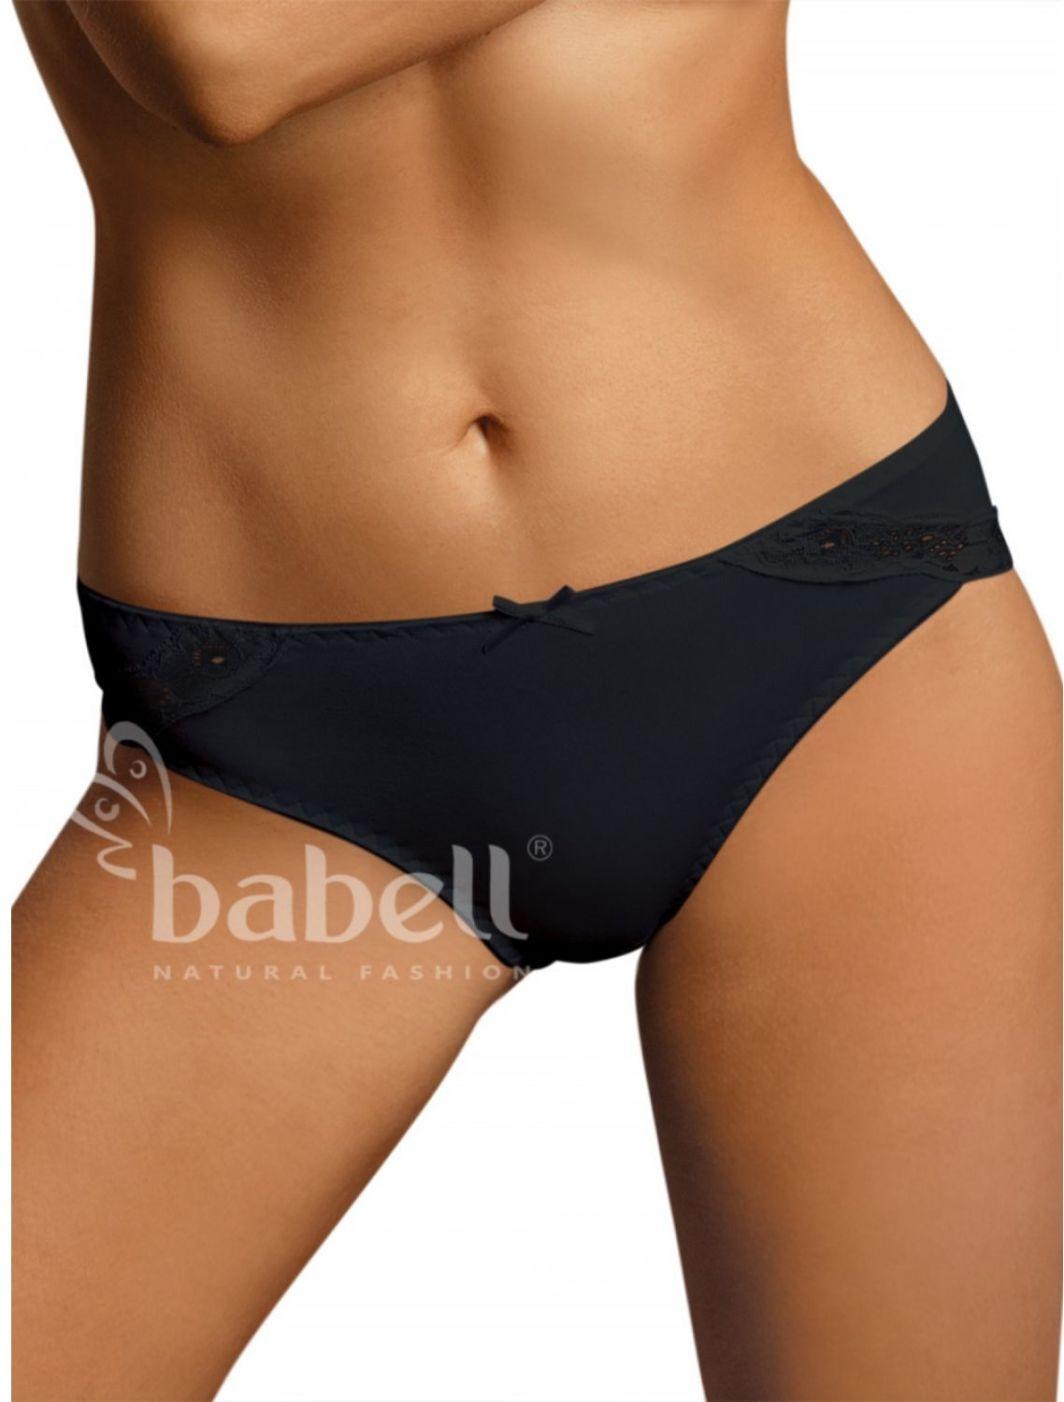 Babell Figi bbl 019 czarny r. XL 1